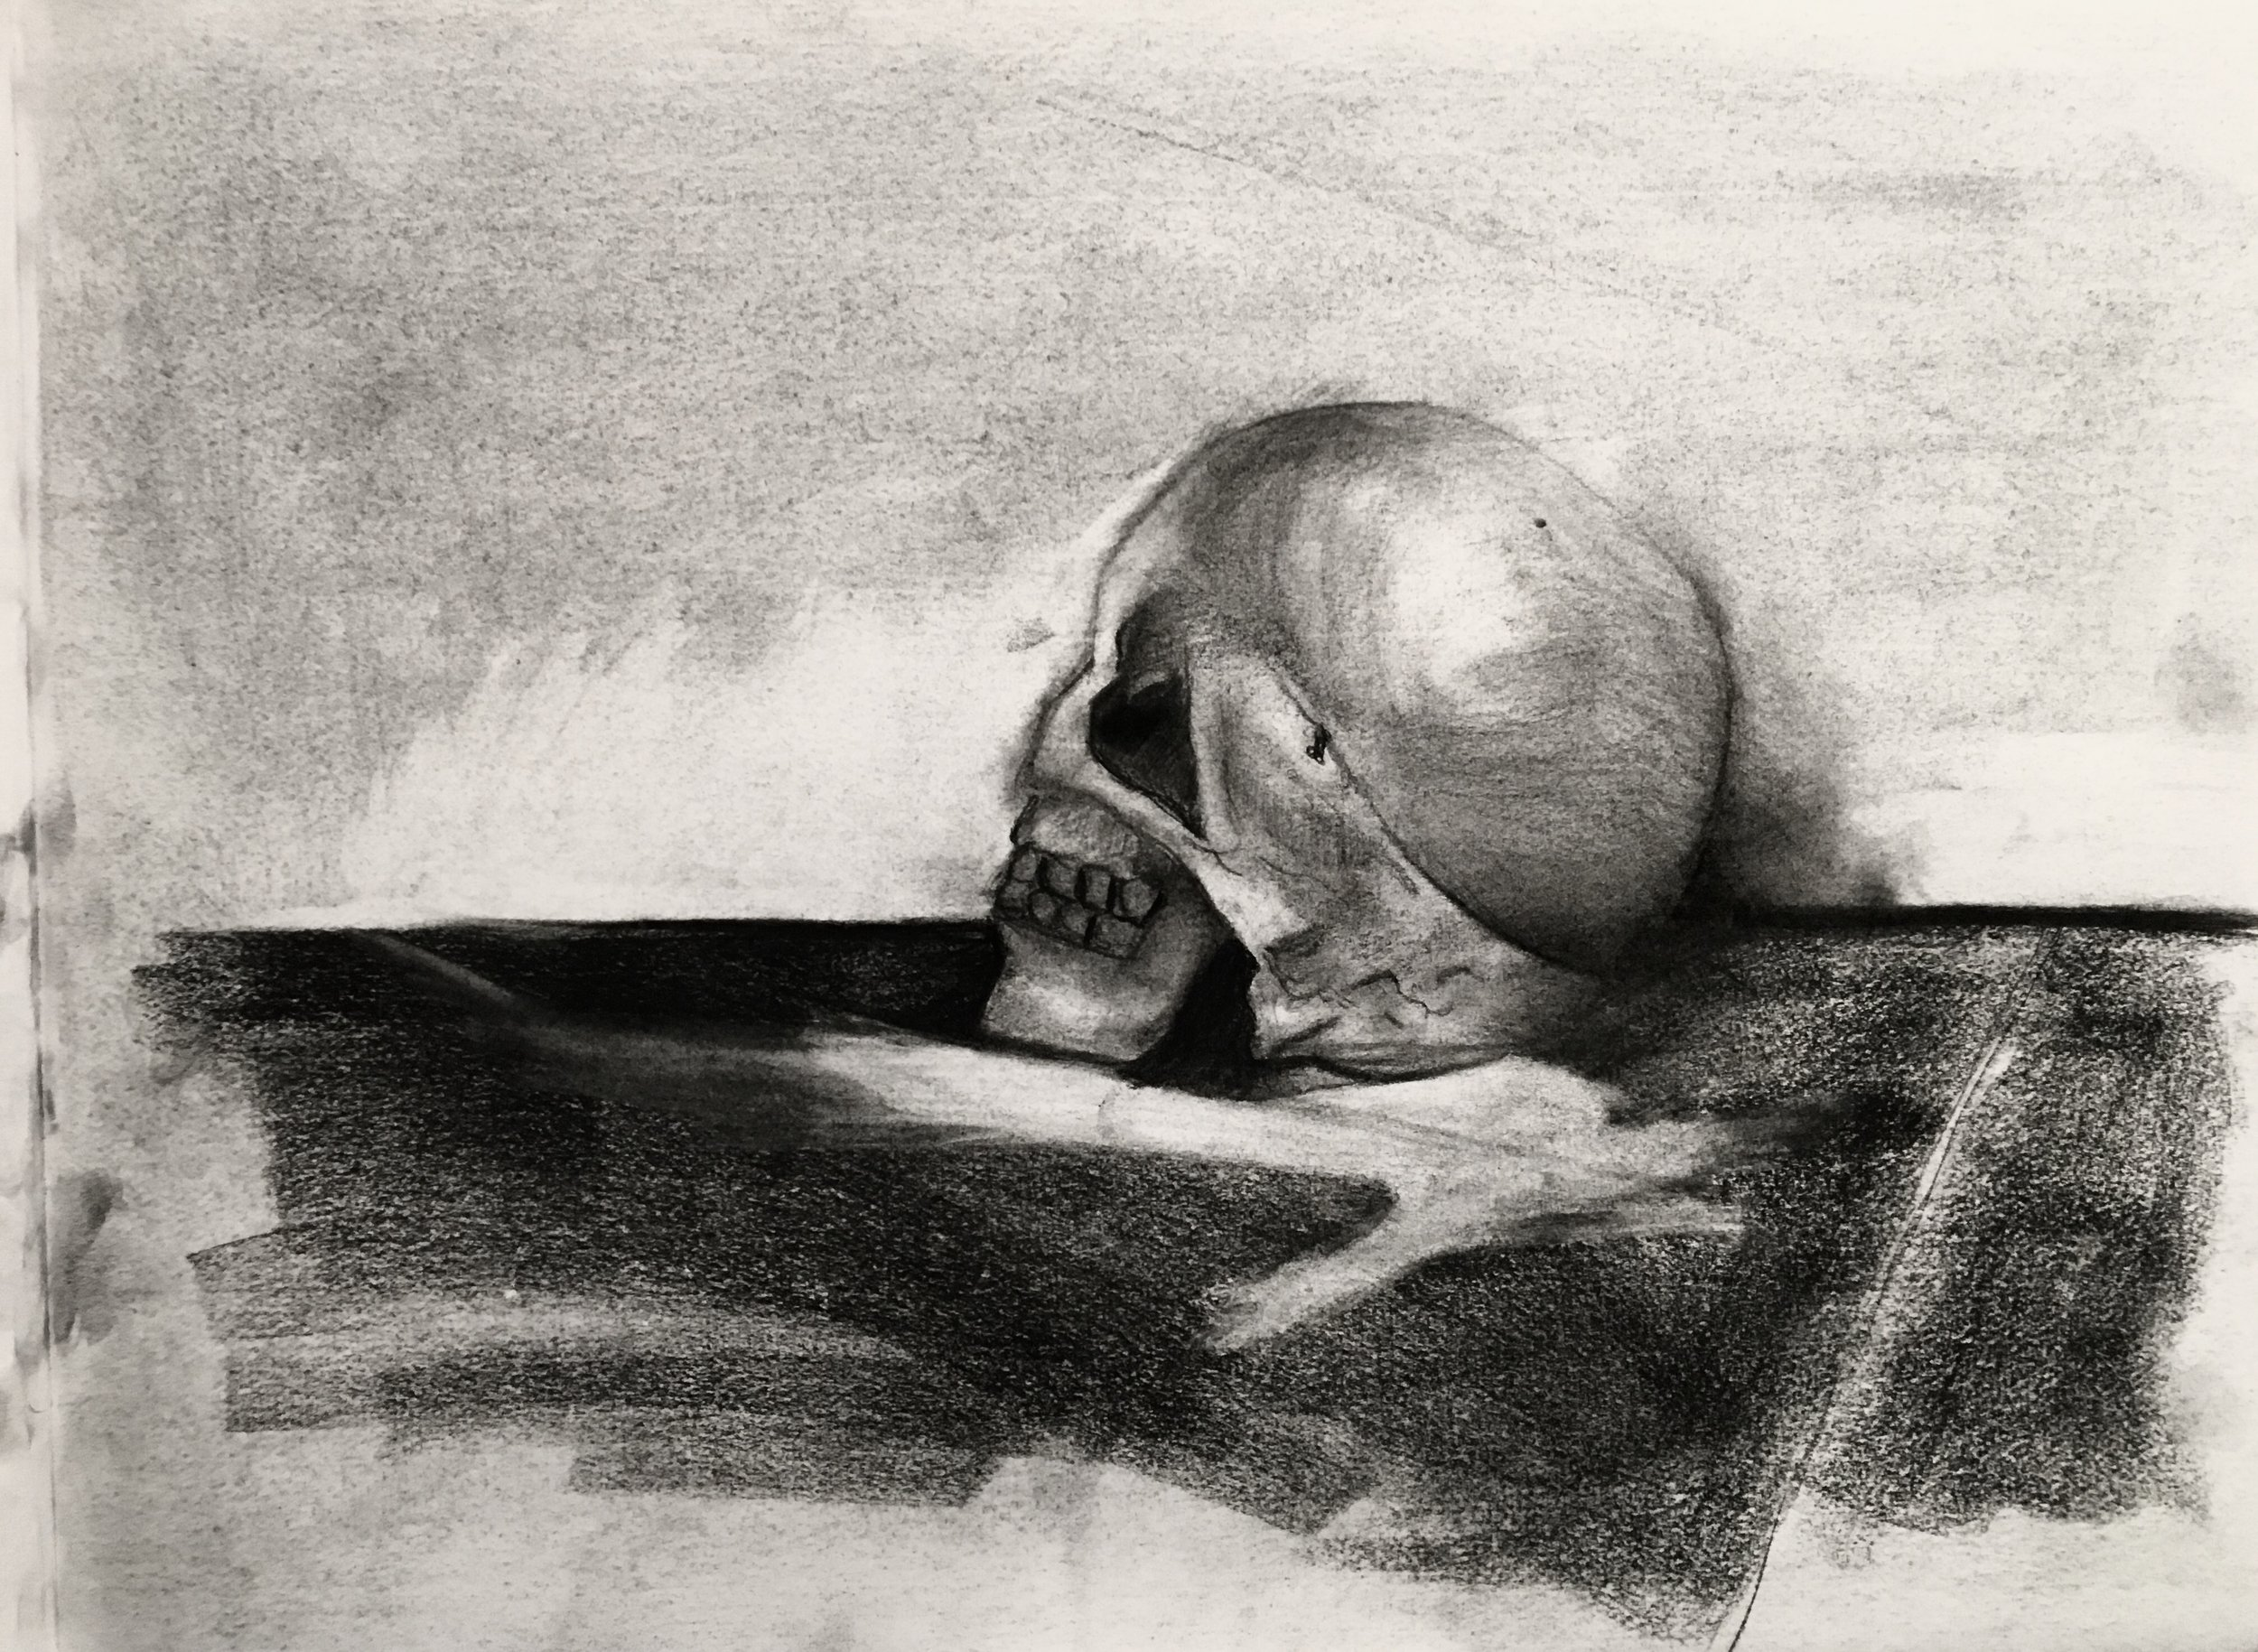 Skull    -     Charcoal - 18x24 - 2017